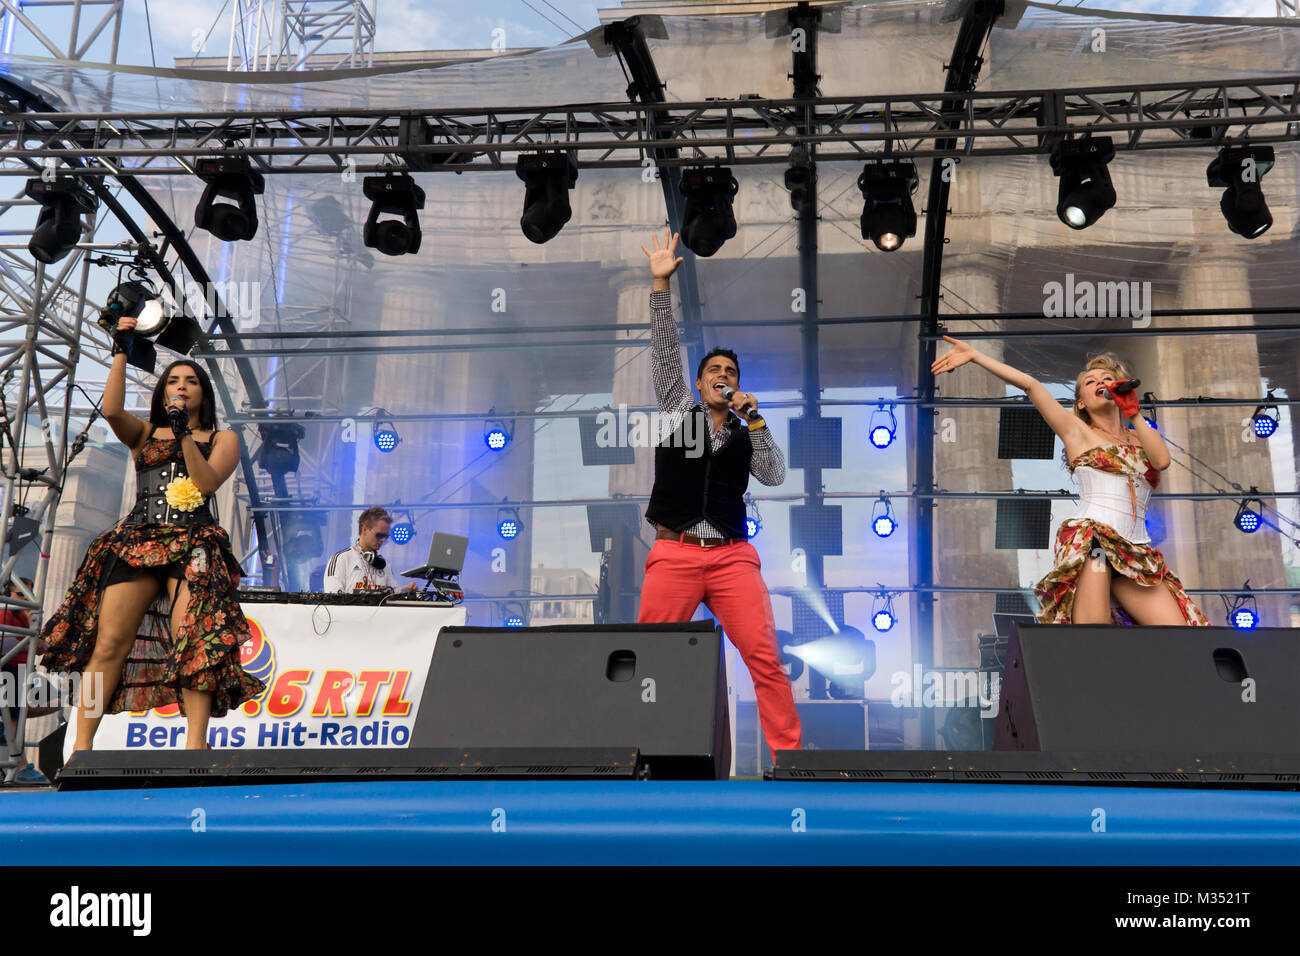 Hot Banditoz, Diba Hakimi, Silva Gonzales und Gabriela Gottschalk (v.l.n.r.), (Latino-Pop) an der Fanmeile auf der Hauptbühne zur Europameisterschaft 2012 am Brandenburger Tor en Berlín. Foto de stock